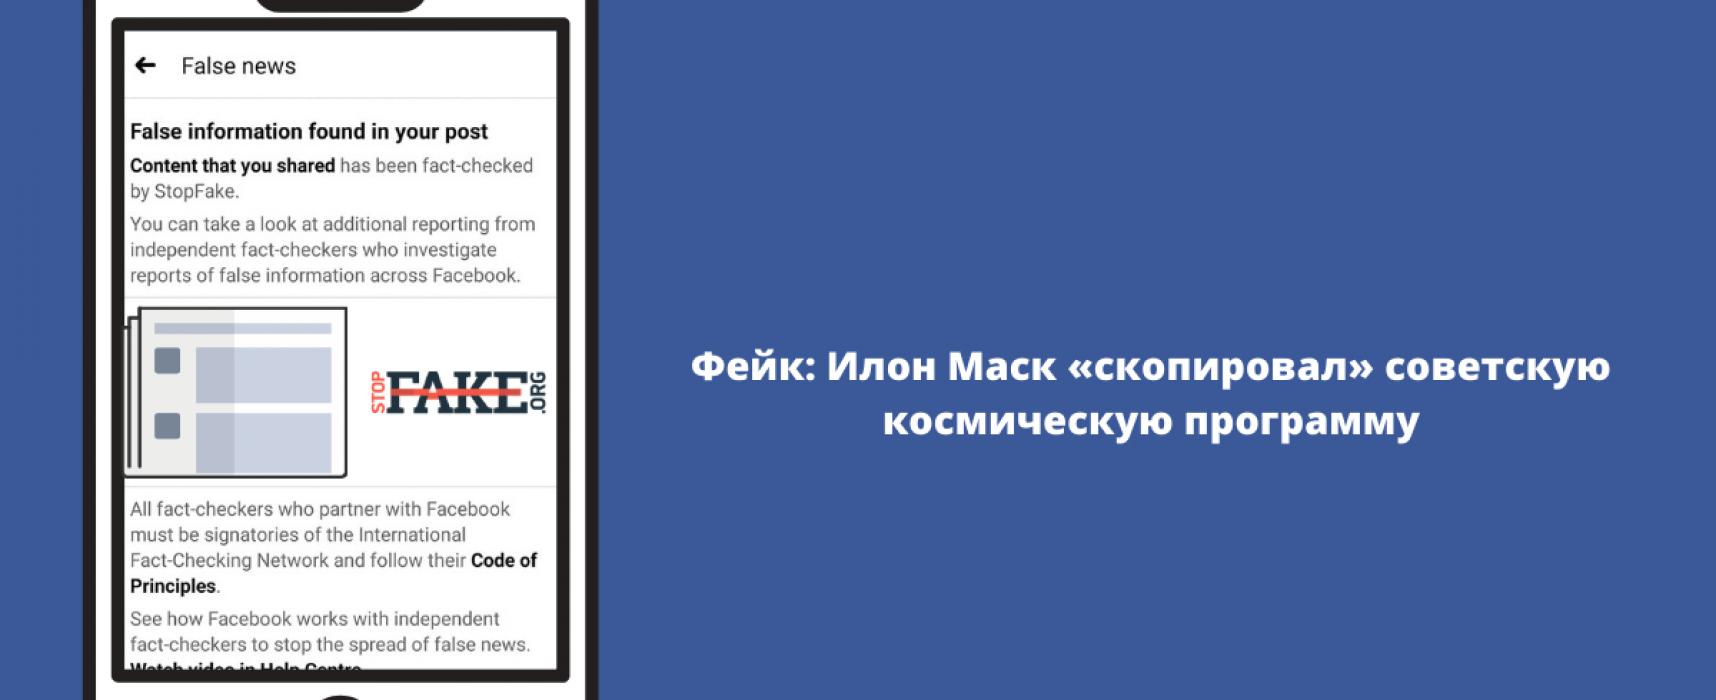 Falso: Elon Musk copió el programa espacial soviético